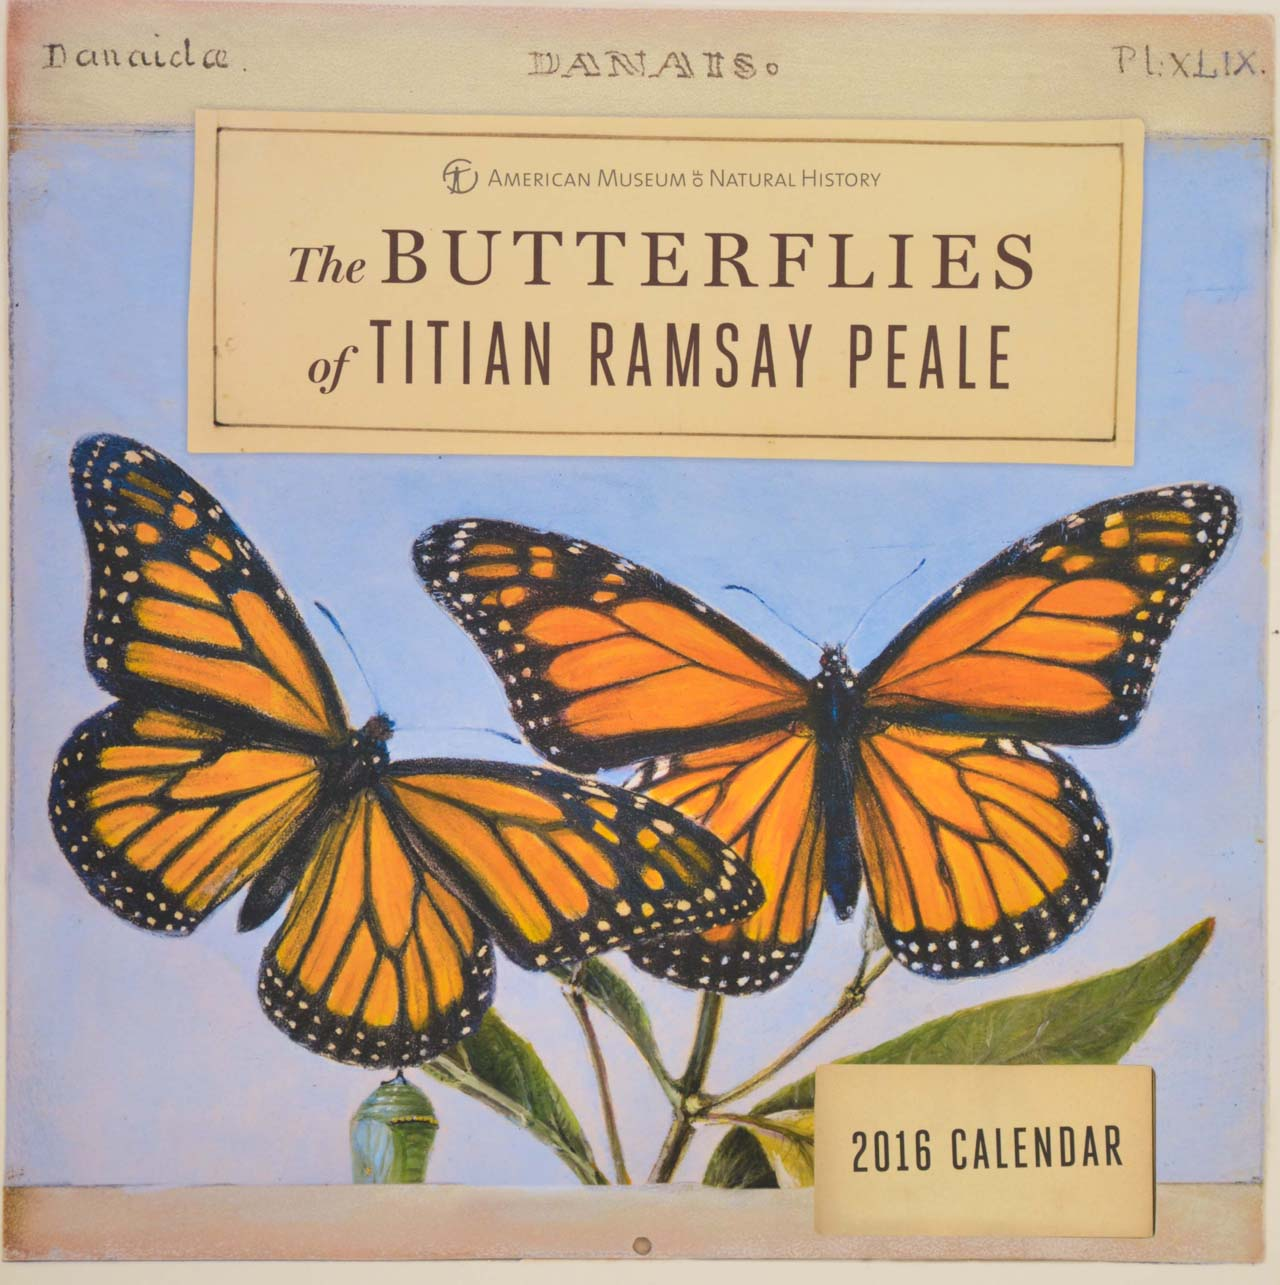 Butterflies of Titian Ramsay Peale 2016 Wall Calendar (via AMNH)